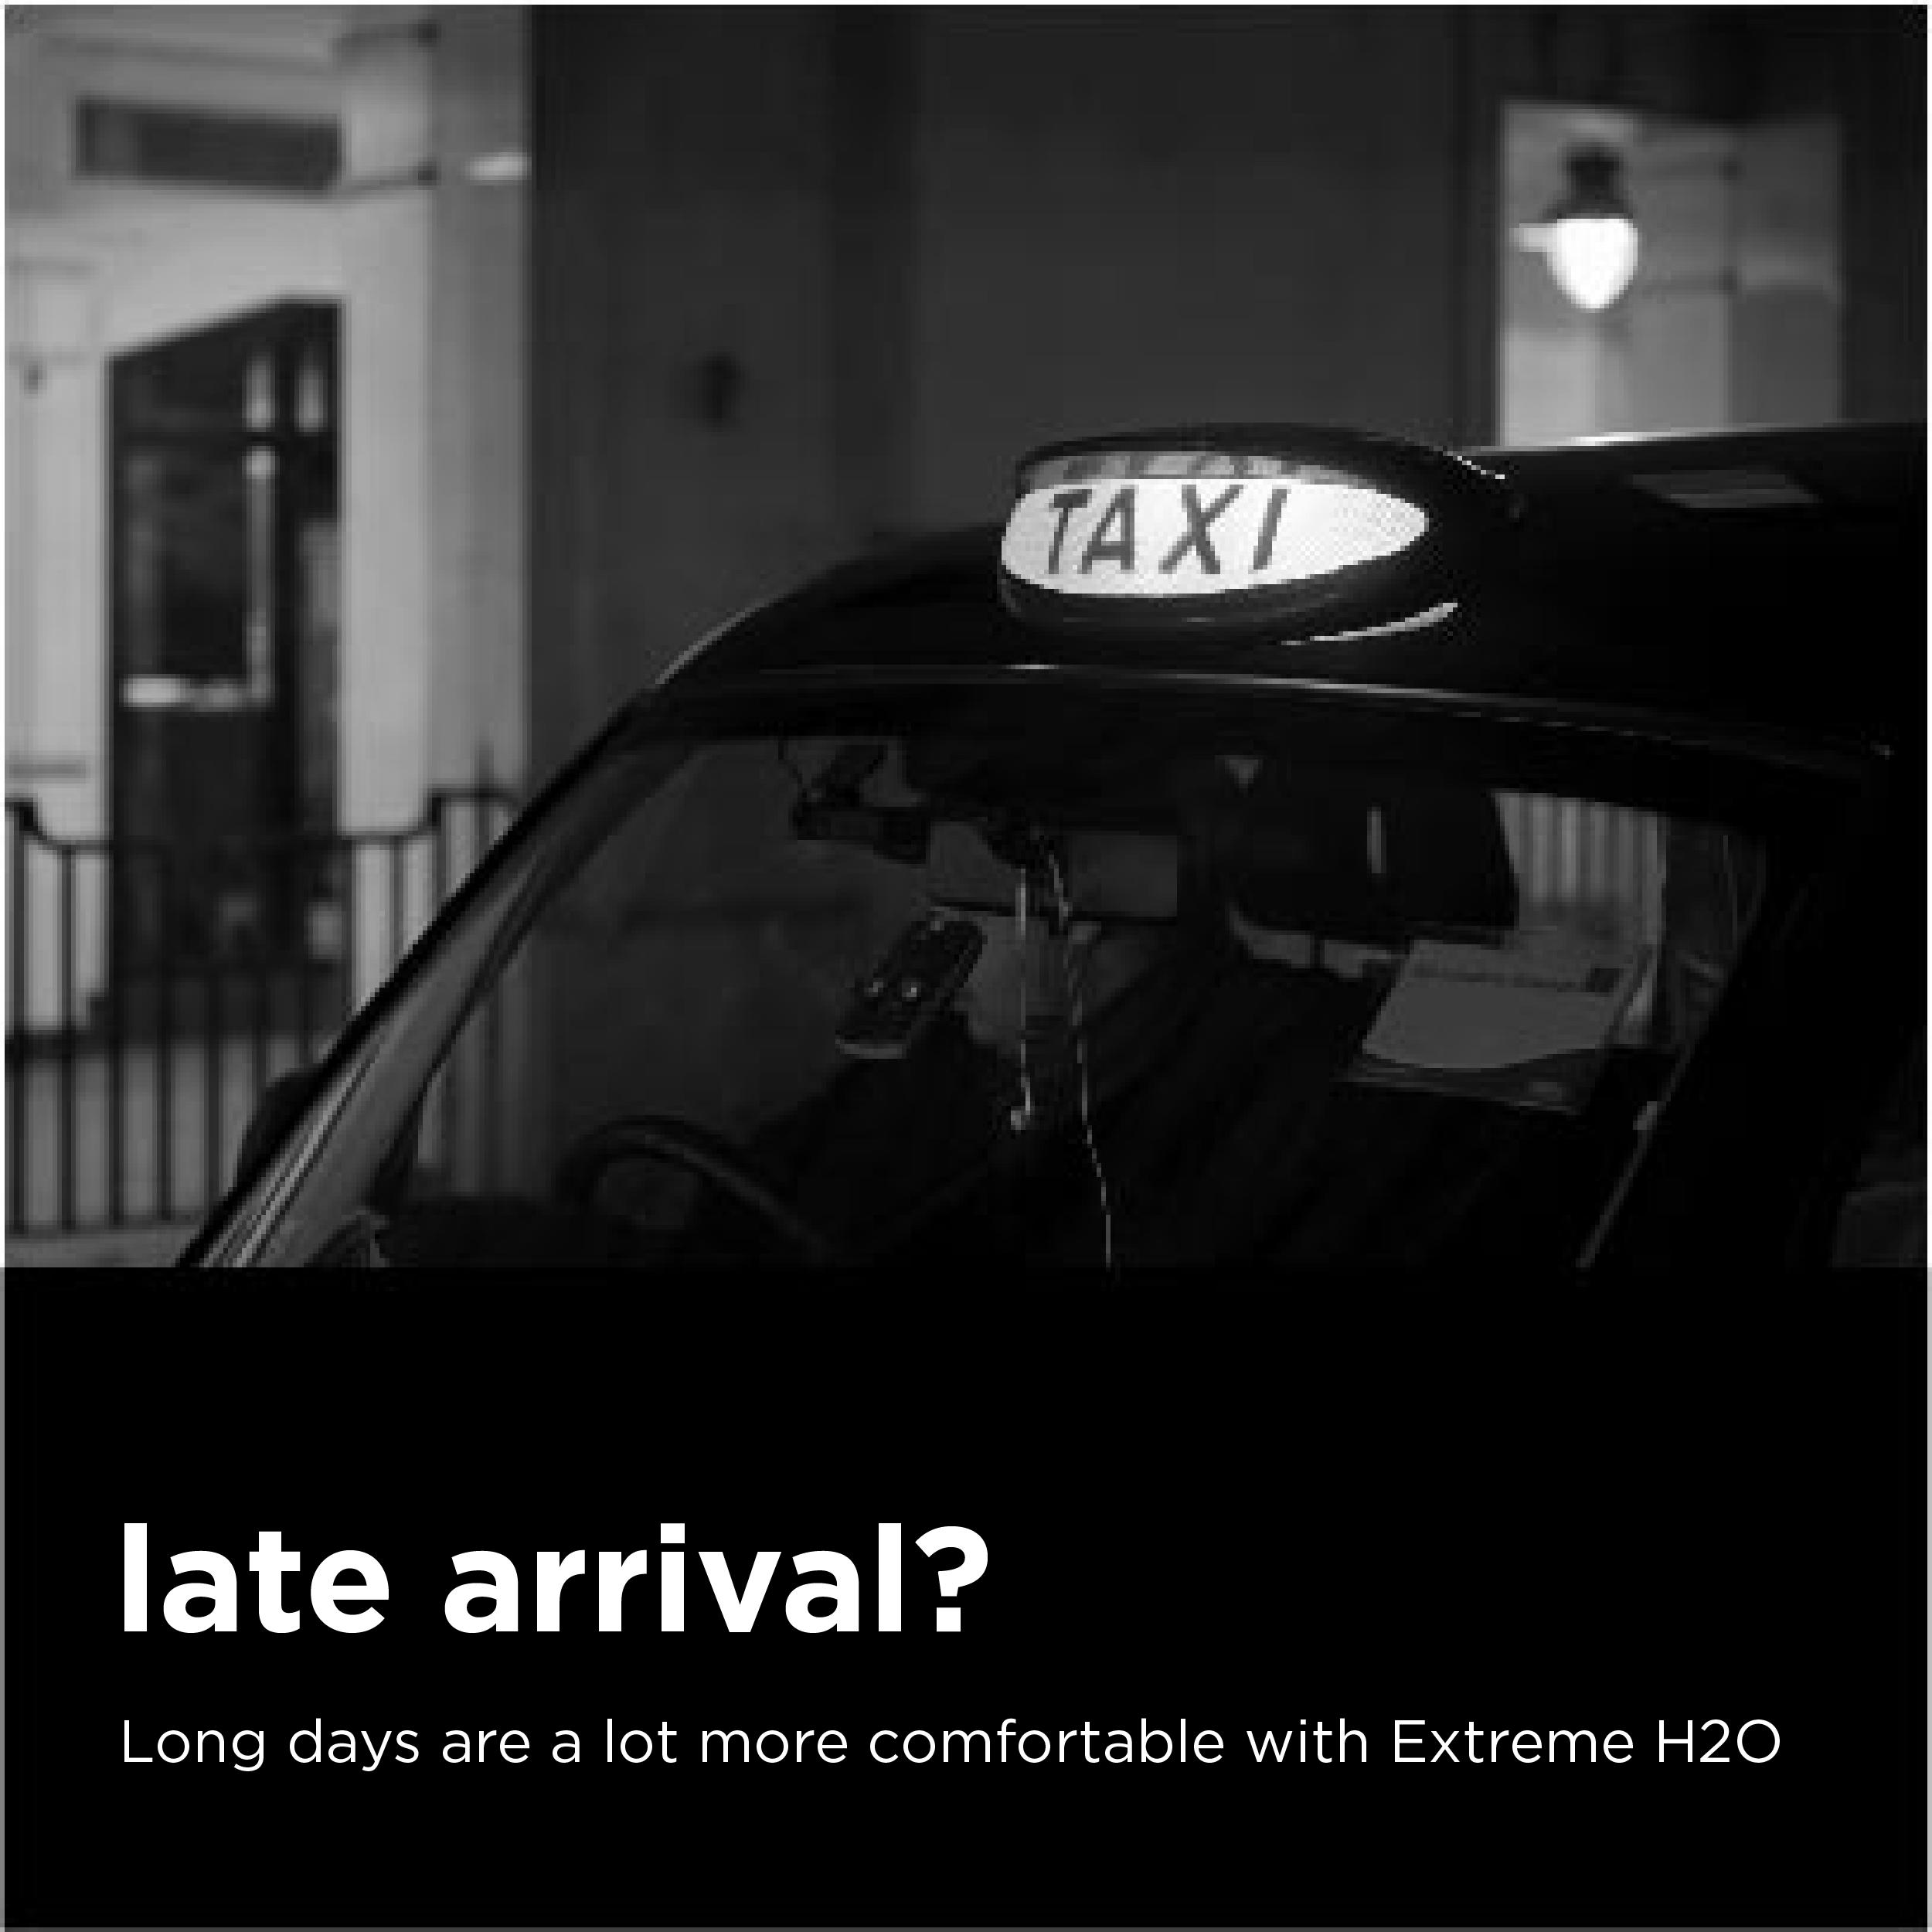 taxi cab at night